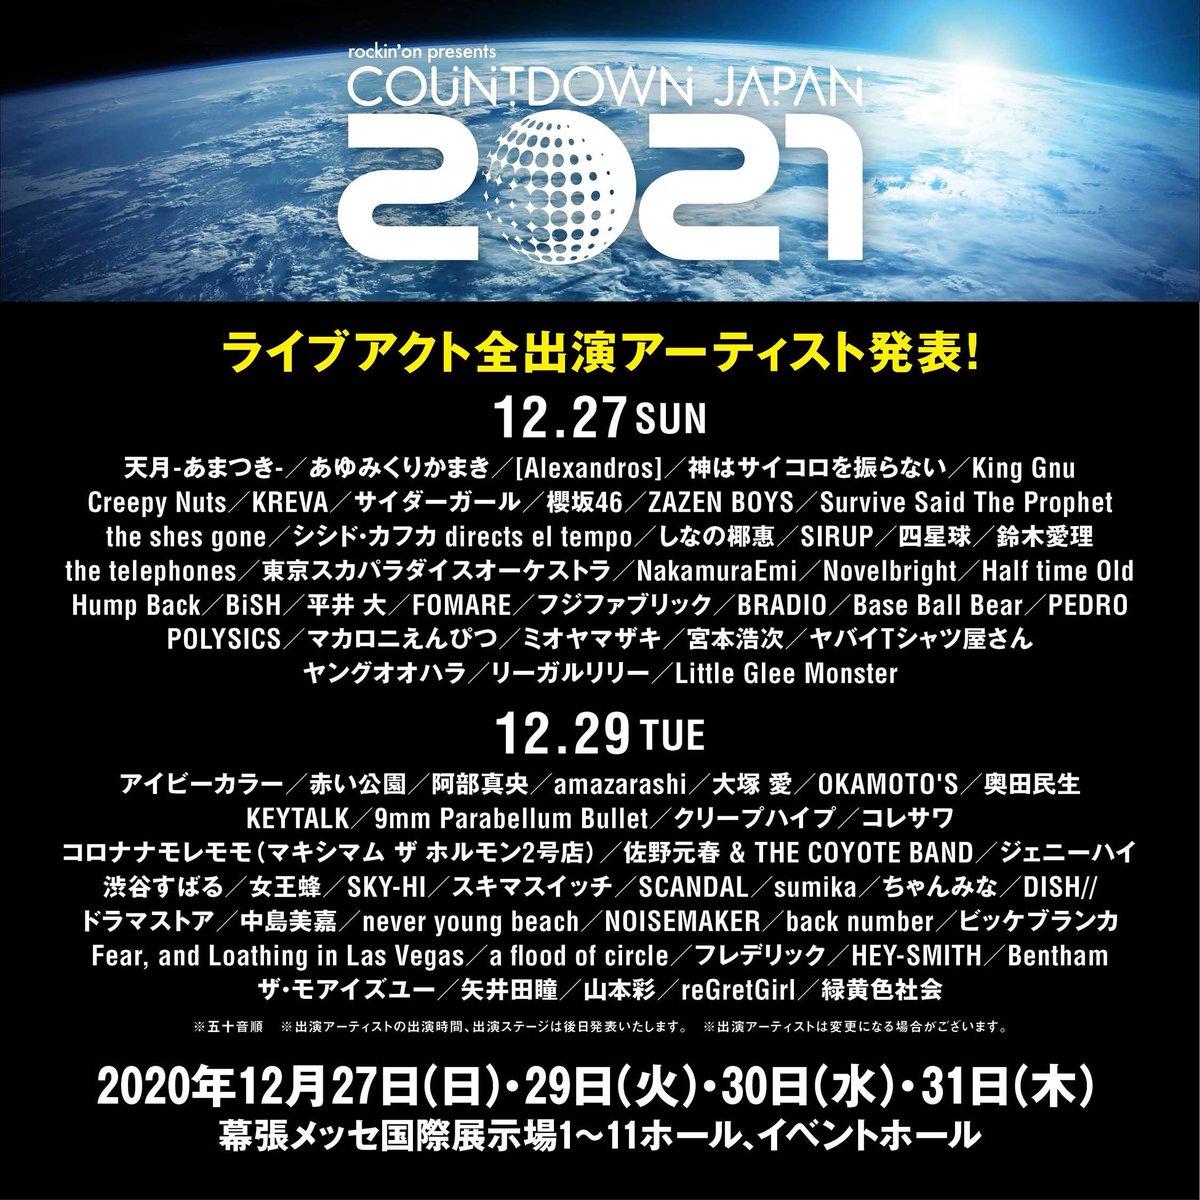 「COUNTDOWN JAPAN 20/21」全出演アーティスト169組を発表